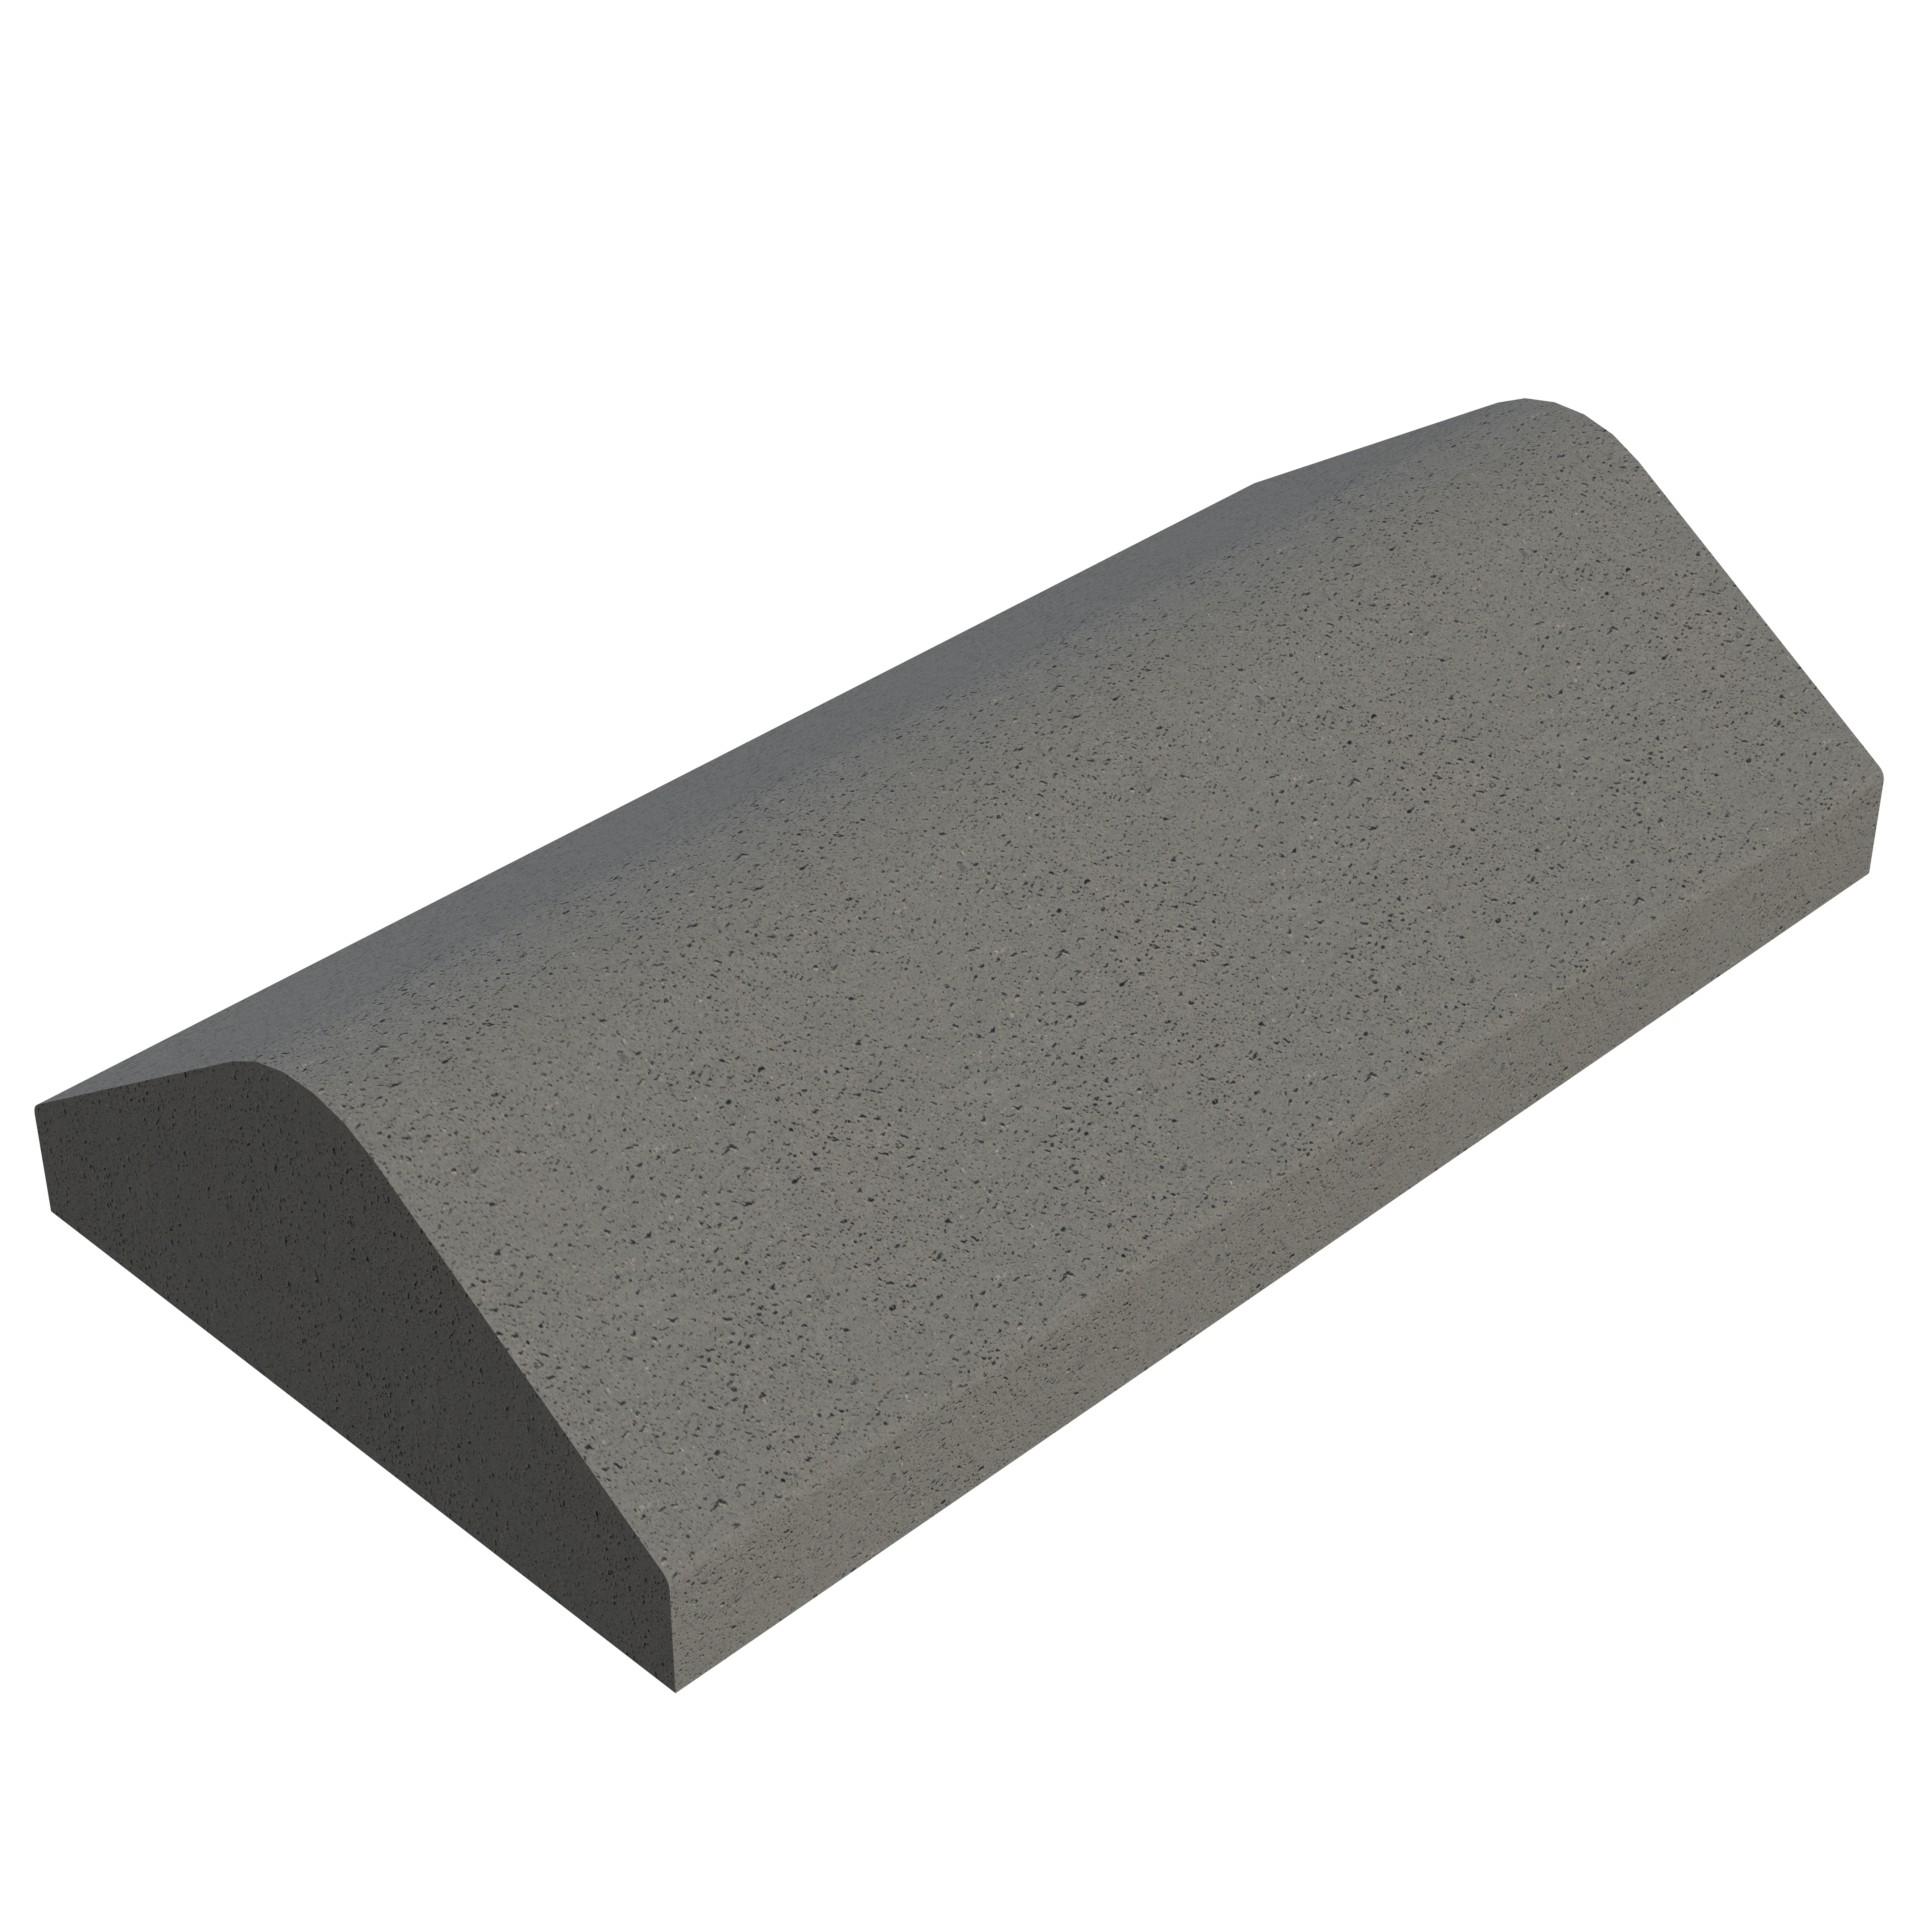 SANDTOFT TILES - Concrete Legged Angle Ridge With Gable Stop End